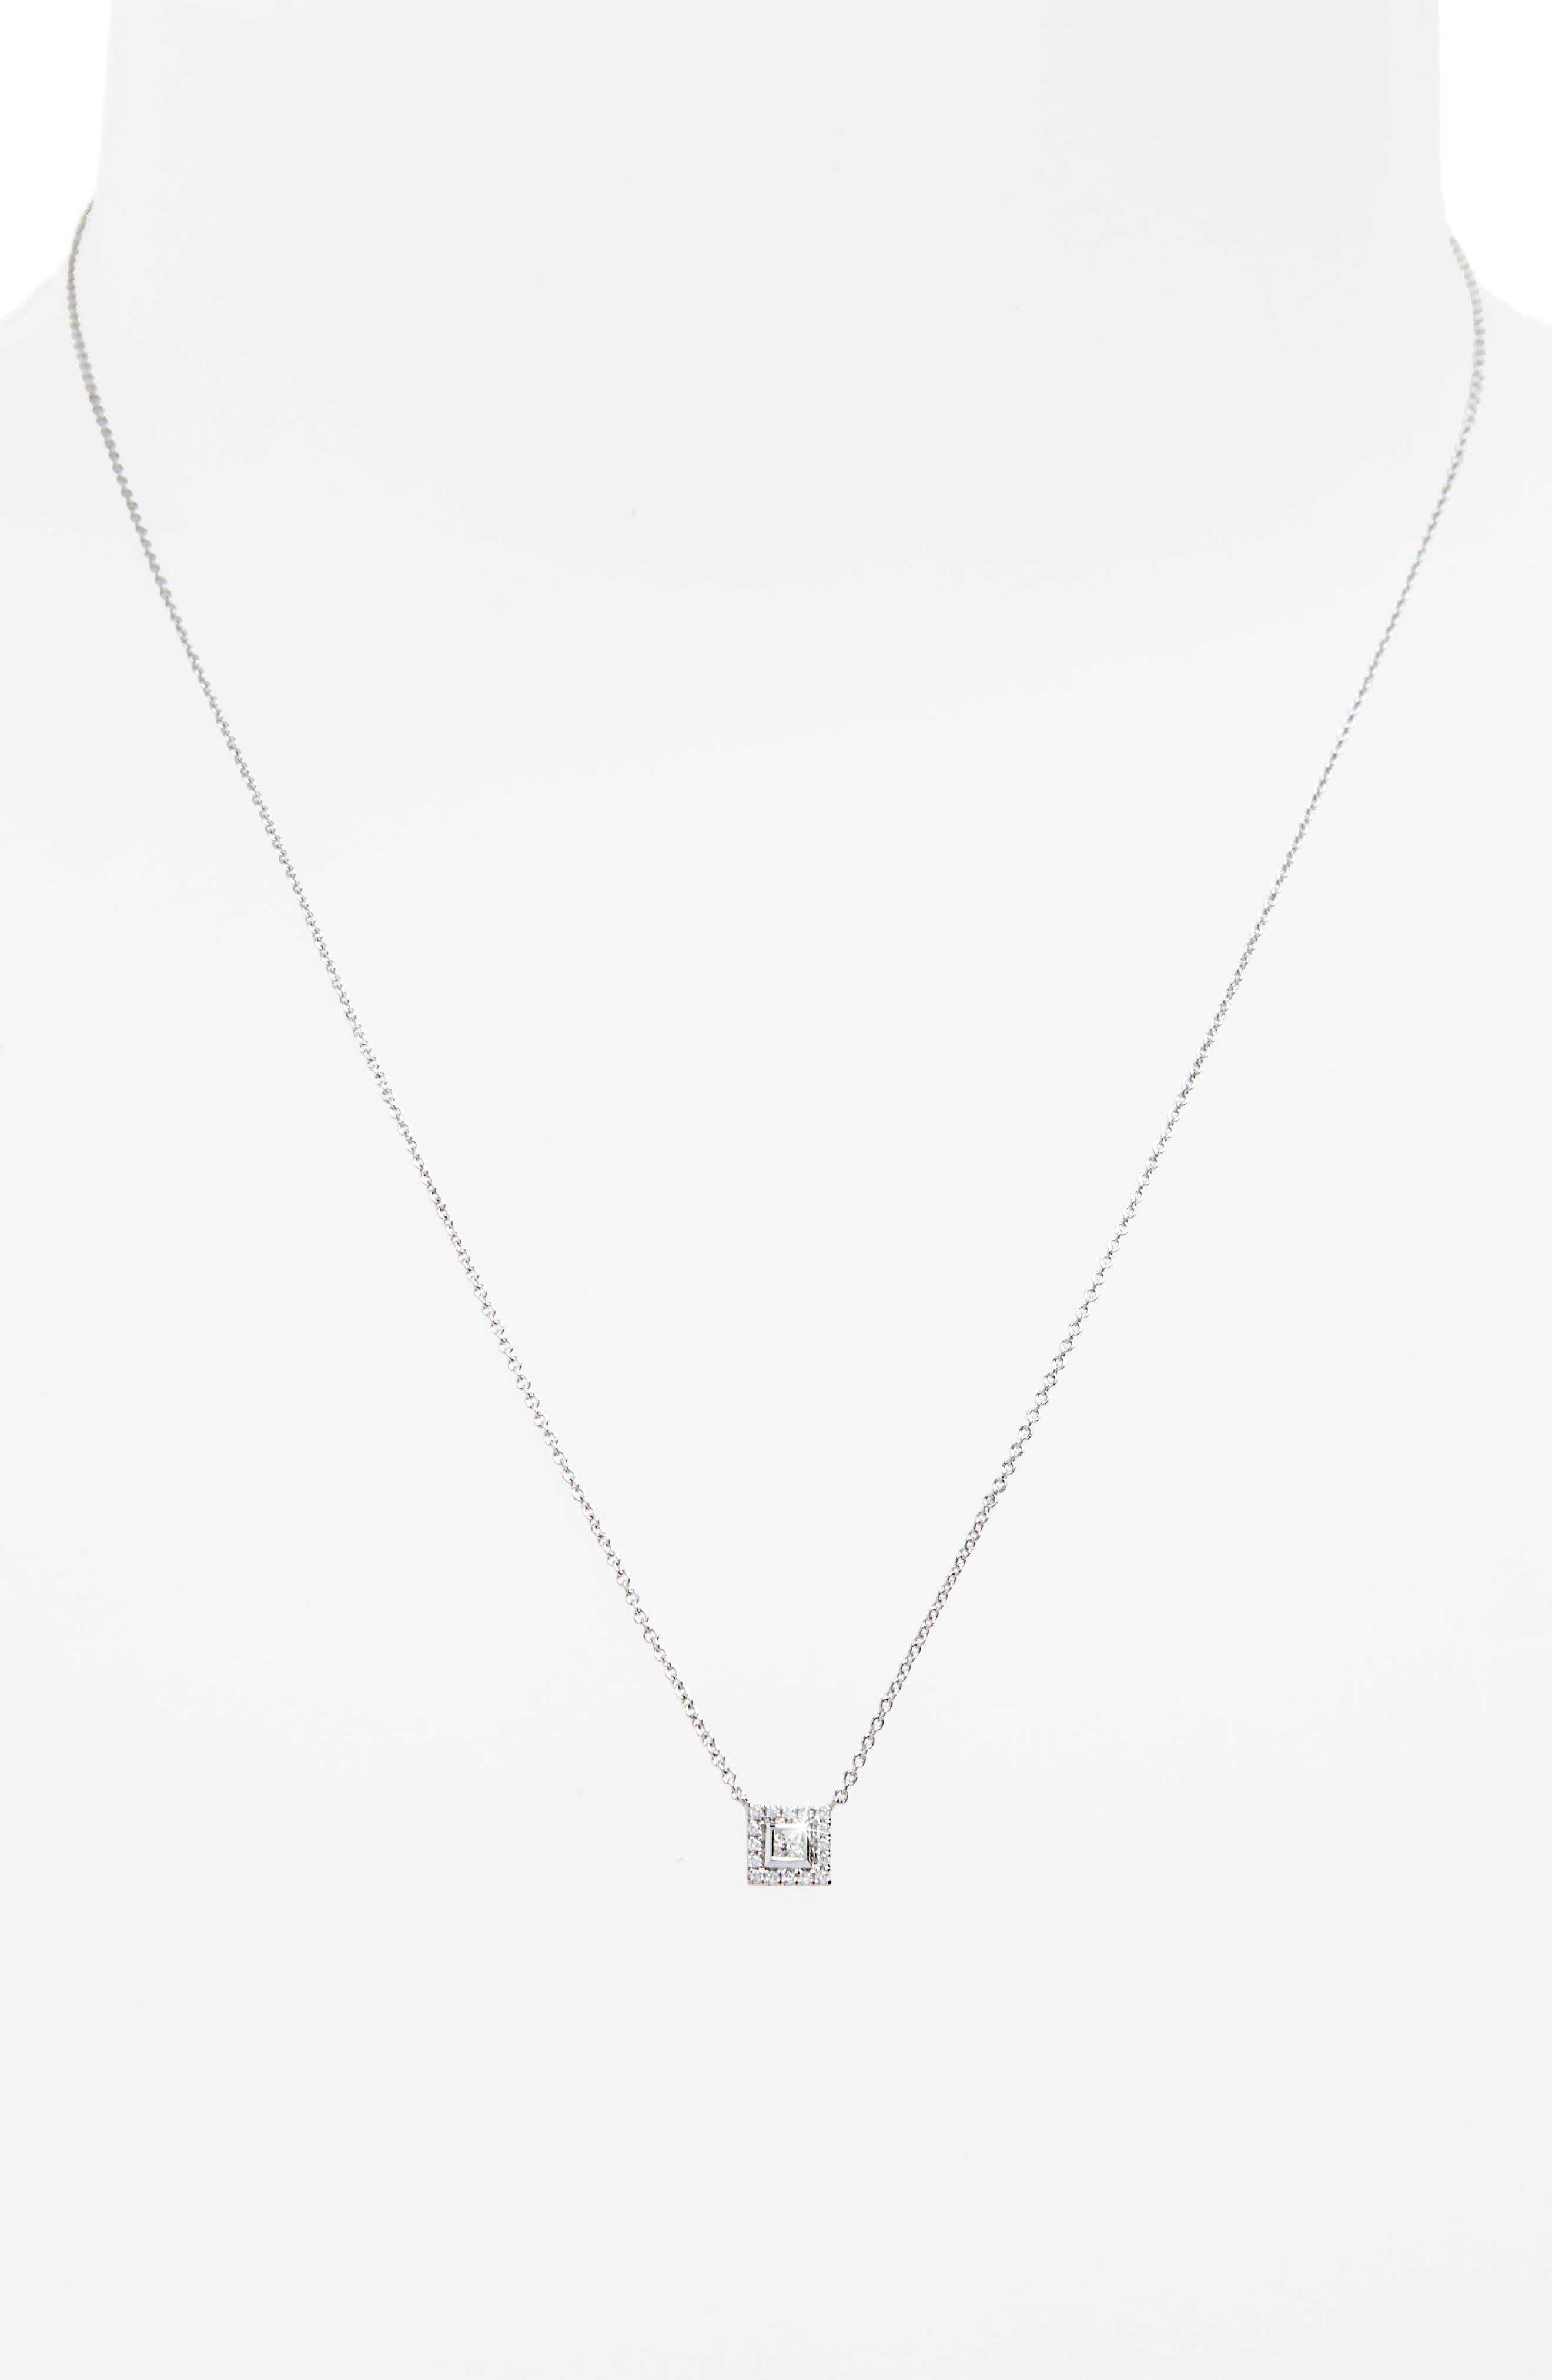 Amara Diamond Square Pendant Necklace,                             Alternate thumbnail 2, color,                             WHITE GOLD